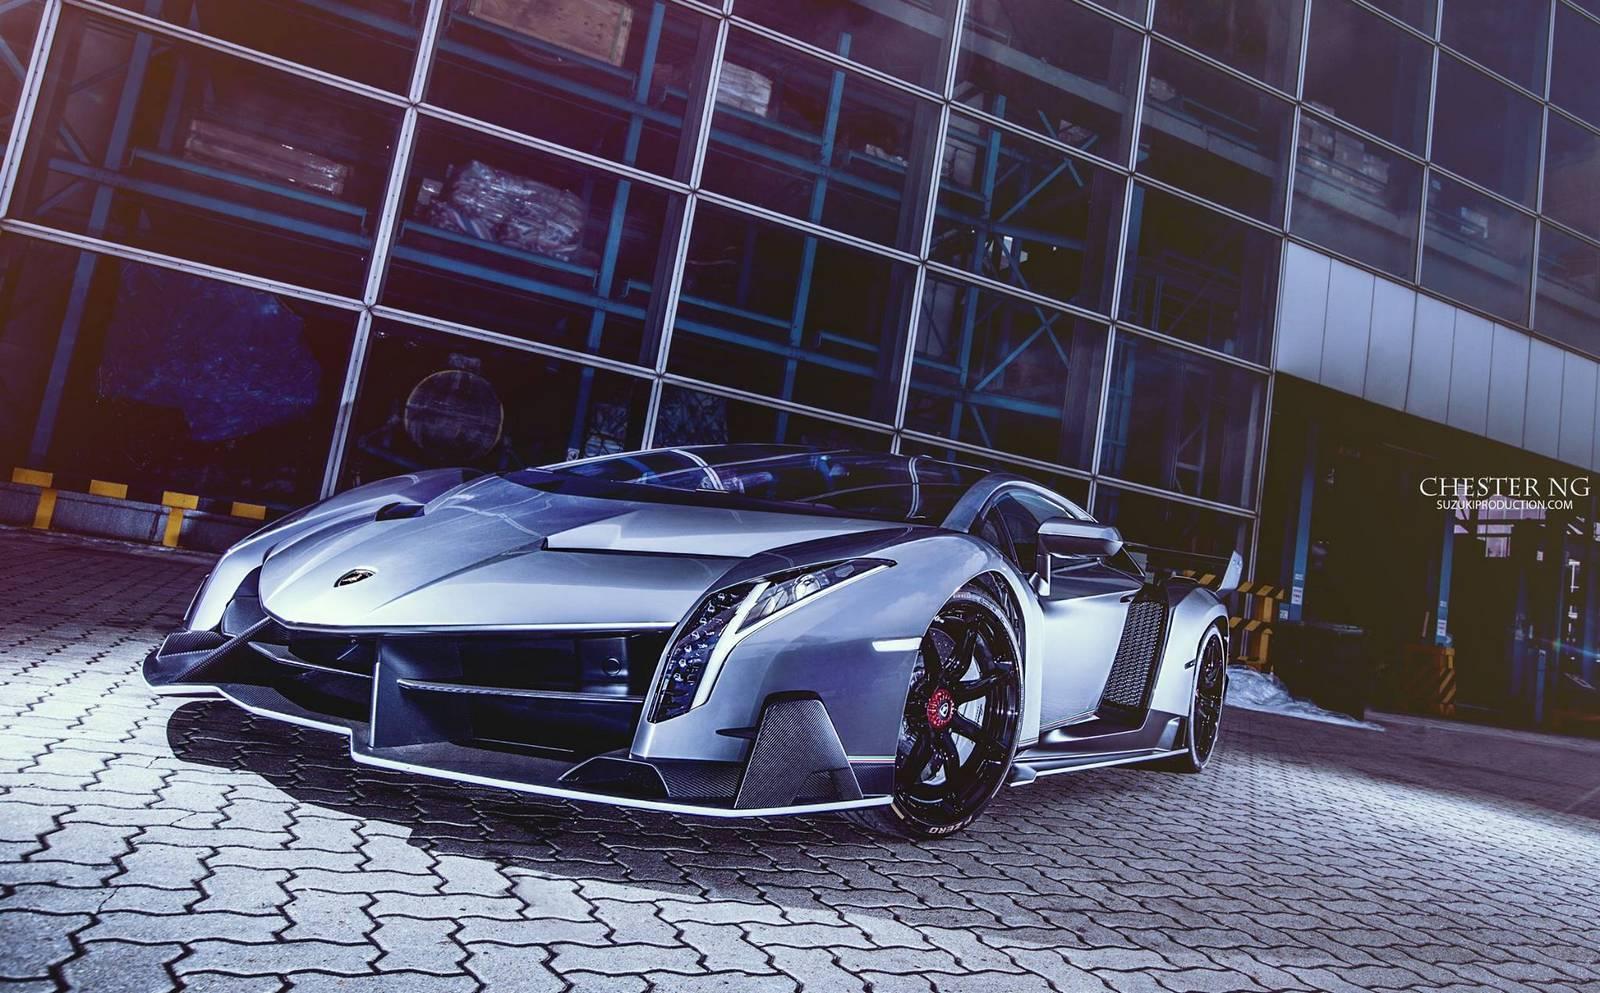 Limited Edition Lamborghini Centenario To Debut At Geneva 2016